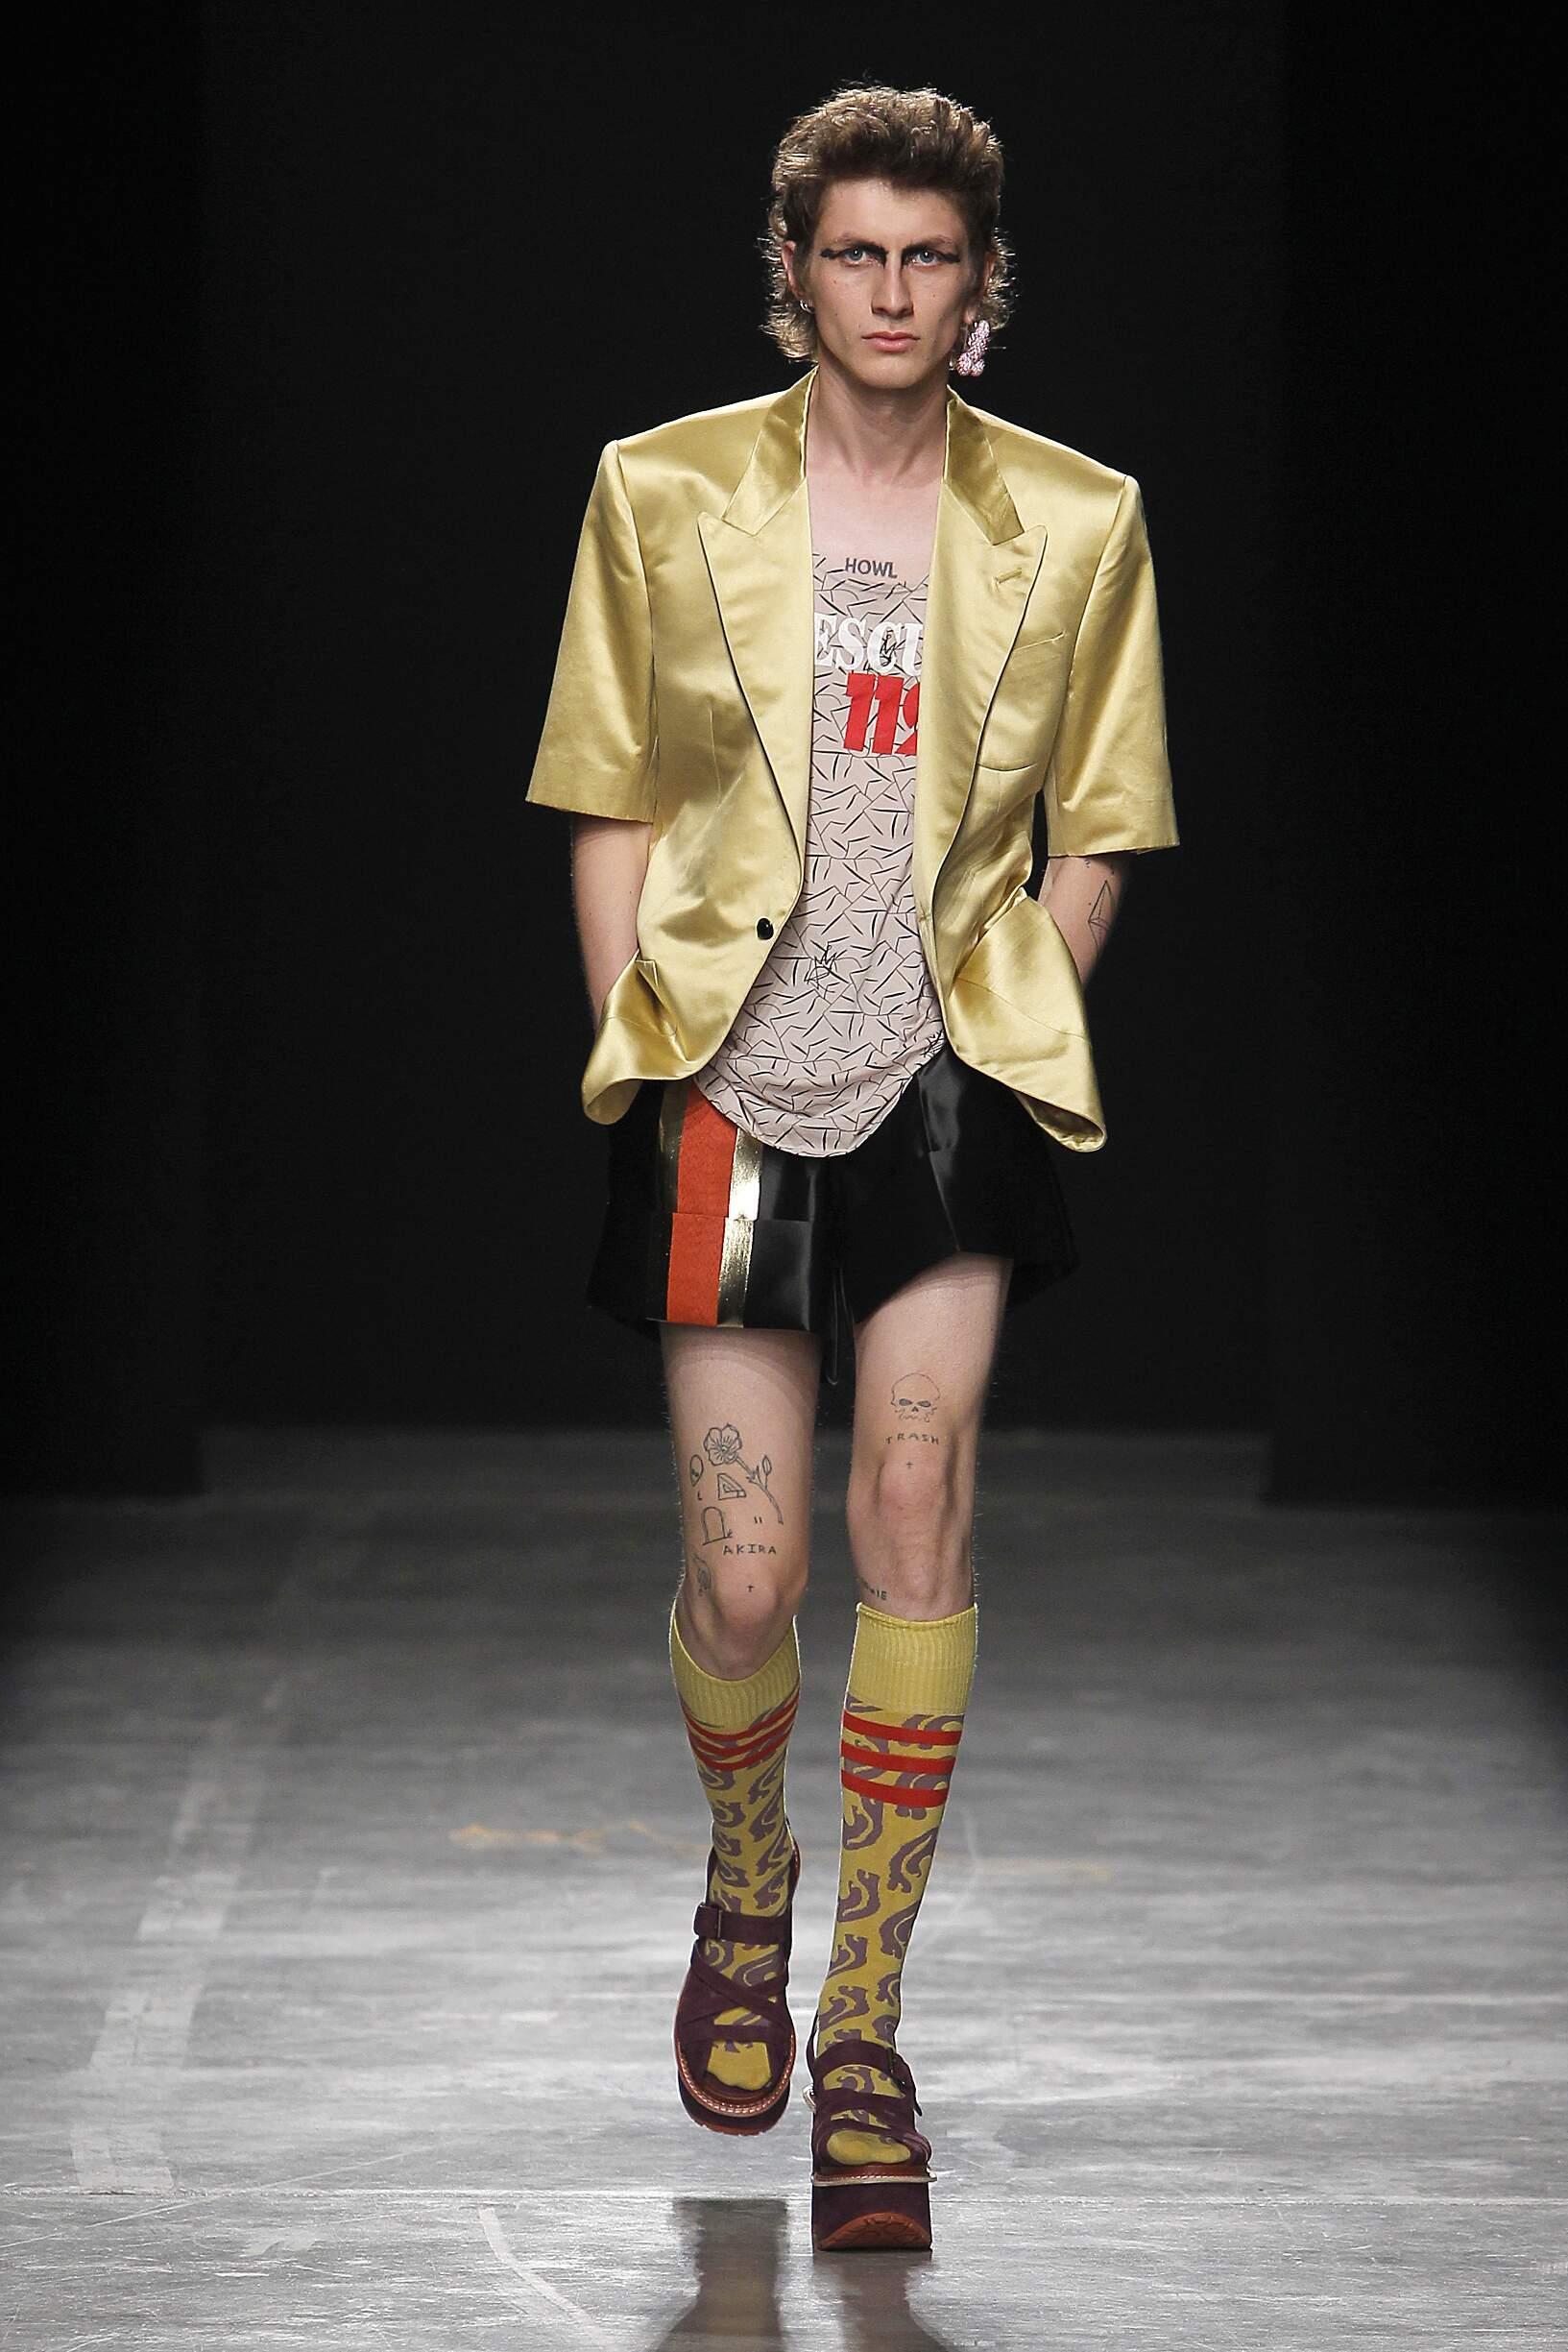 2017 Andreas Kronthaler for Vivienne Westwood Catwalk Paris Fashion Week